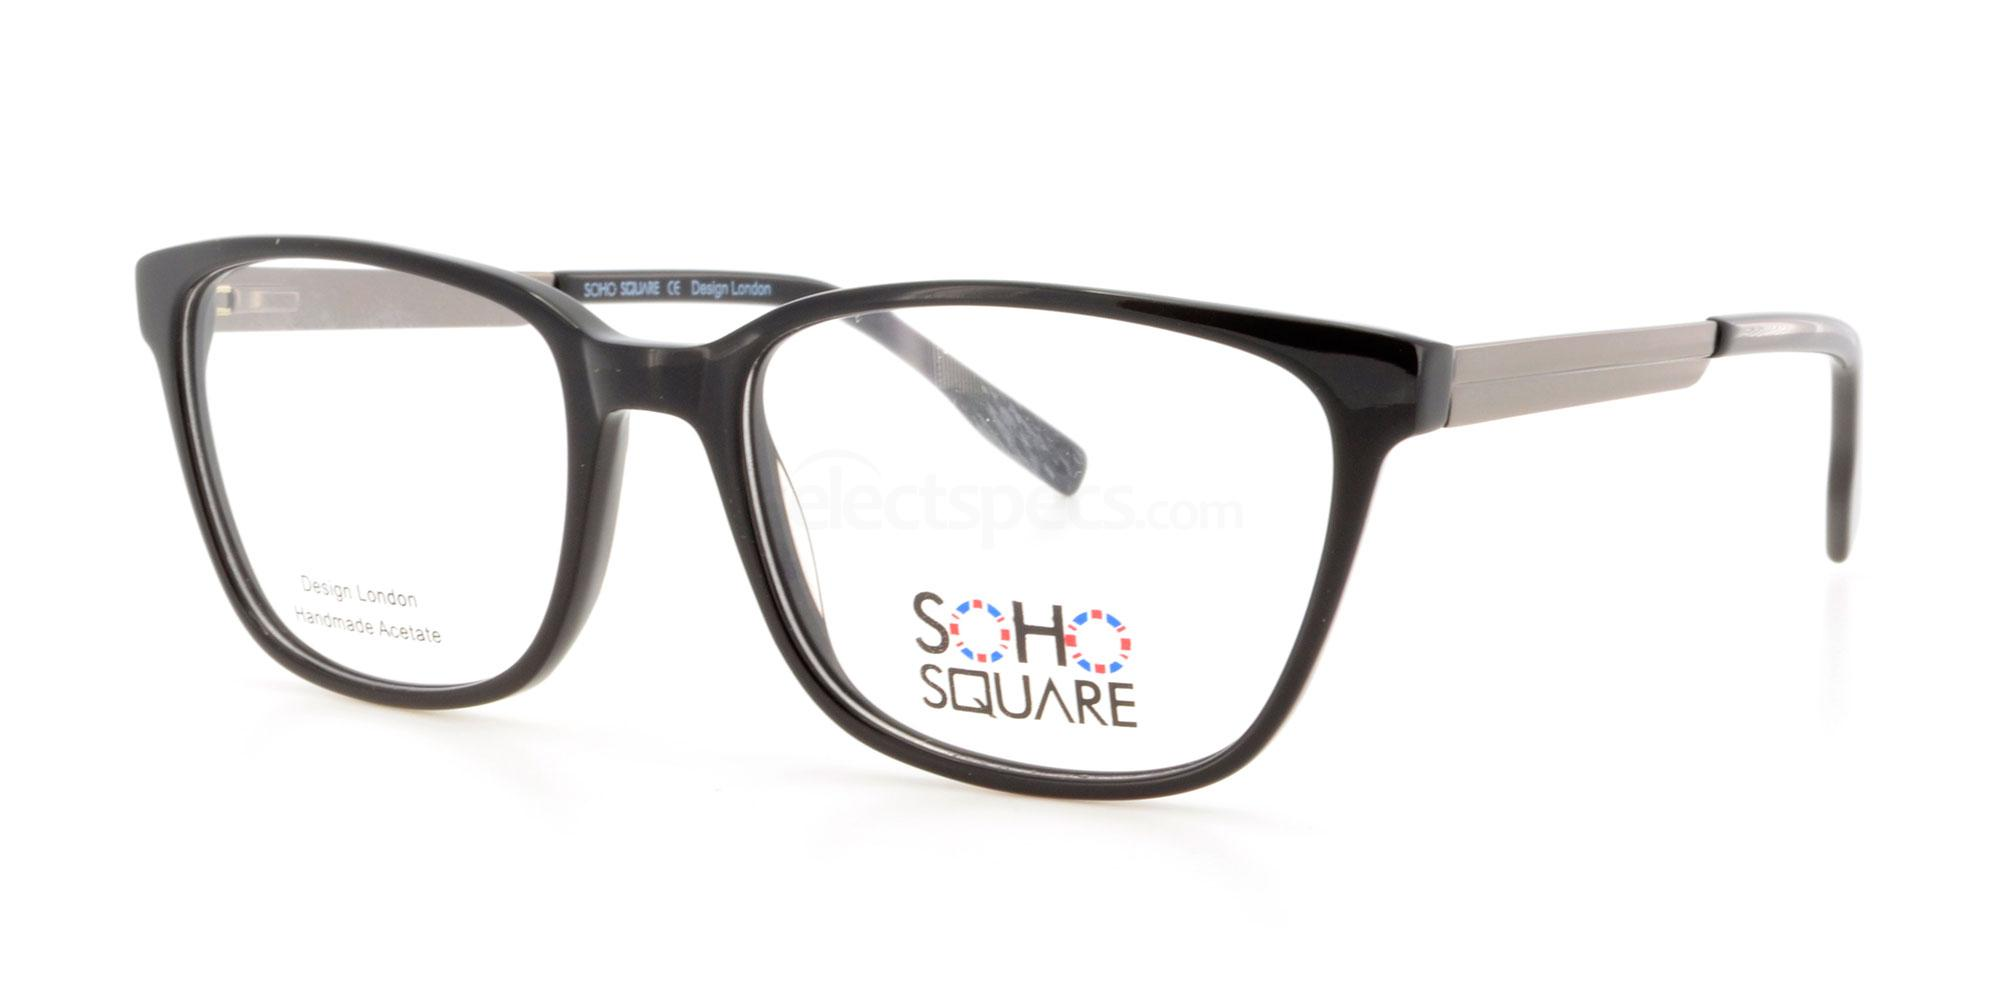 C1 SS 027 Glasses, Soho Square